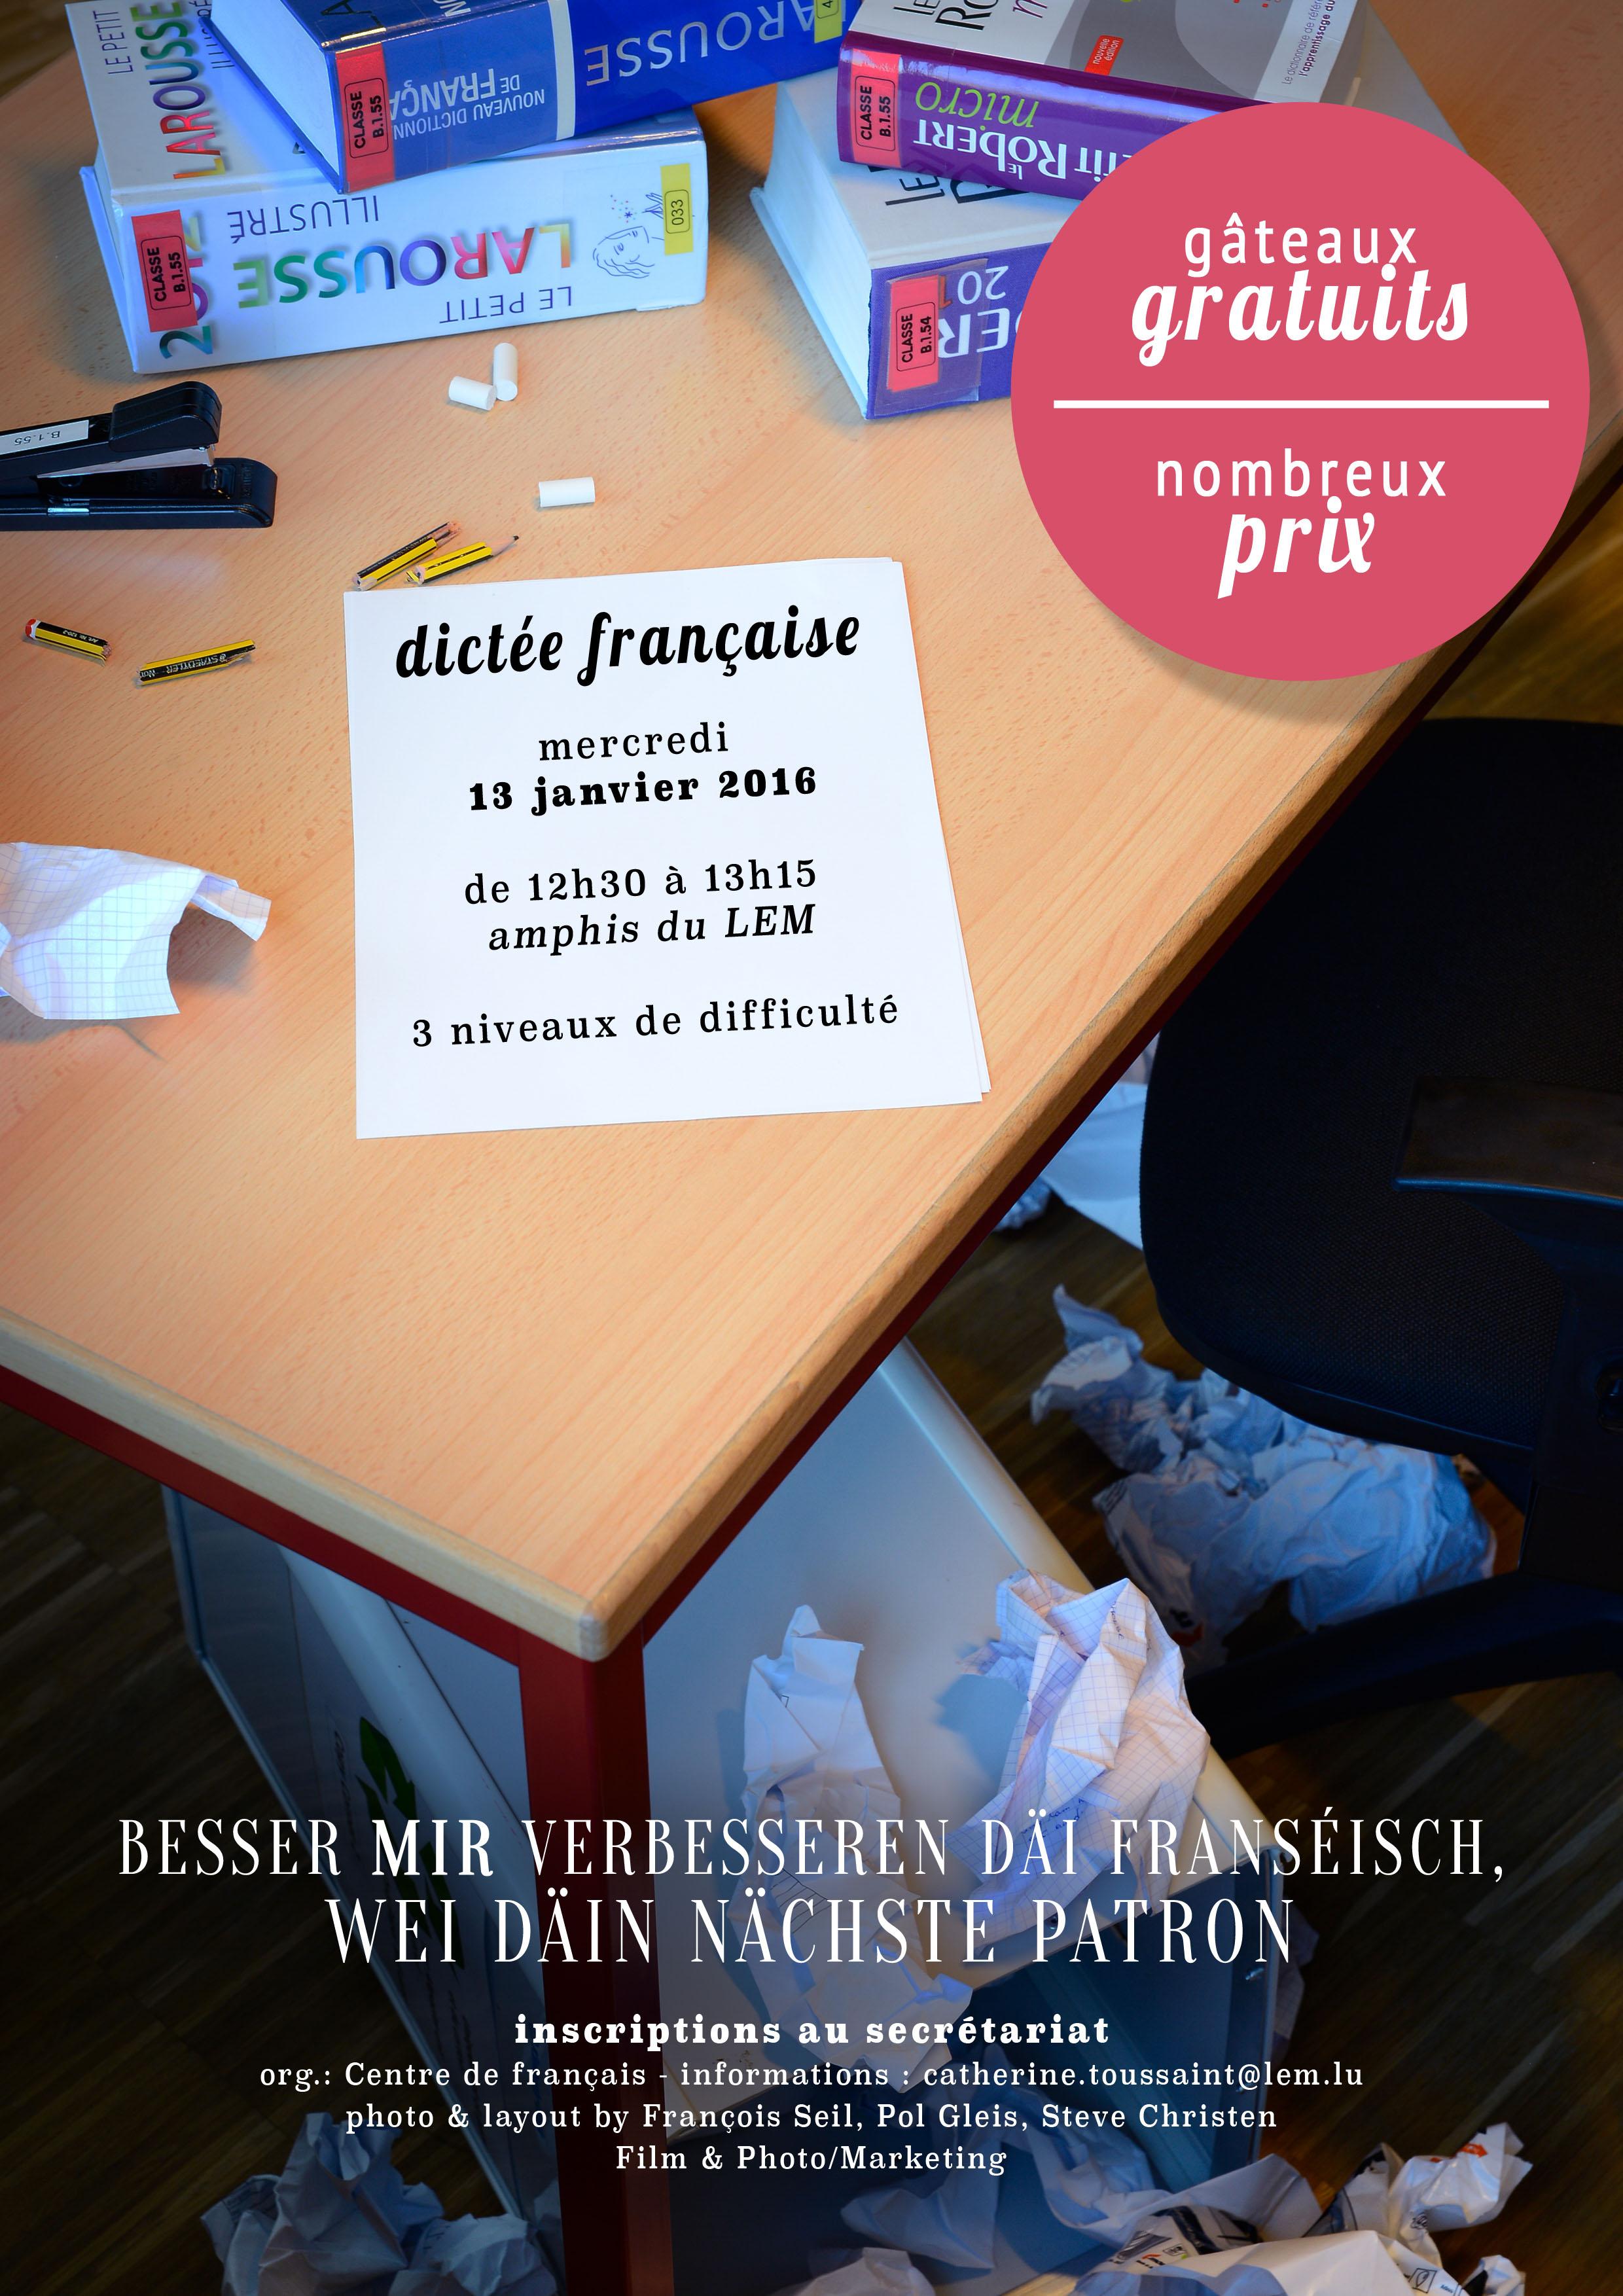 2015 dictee francaise